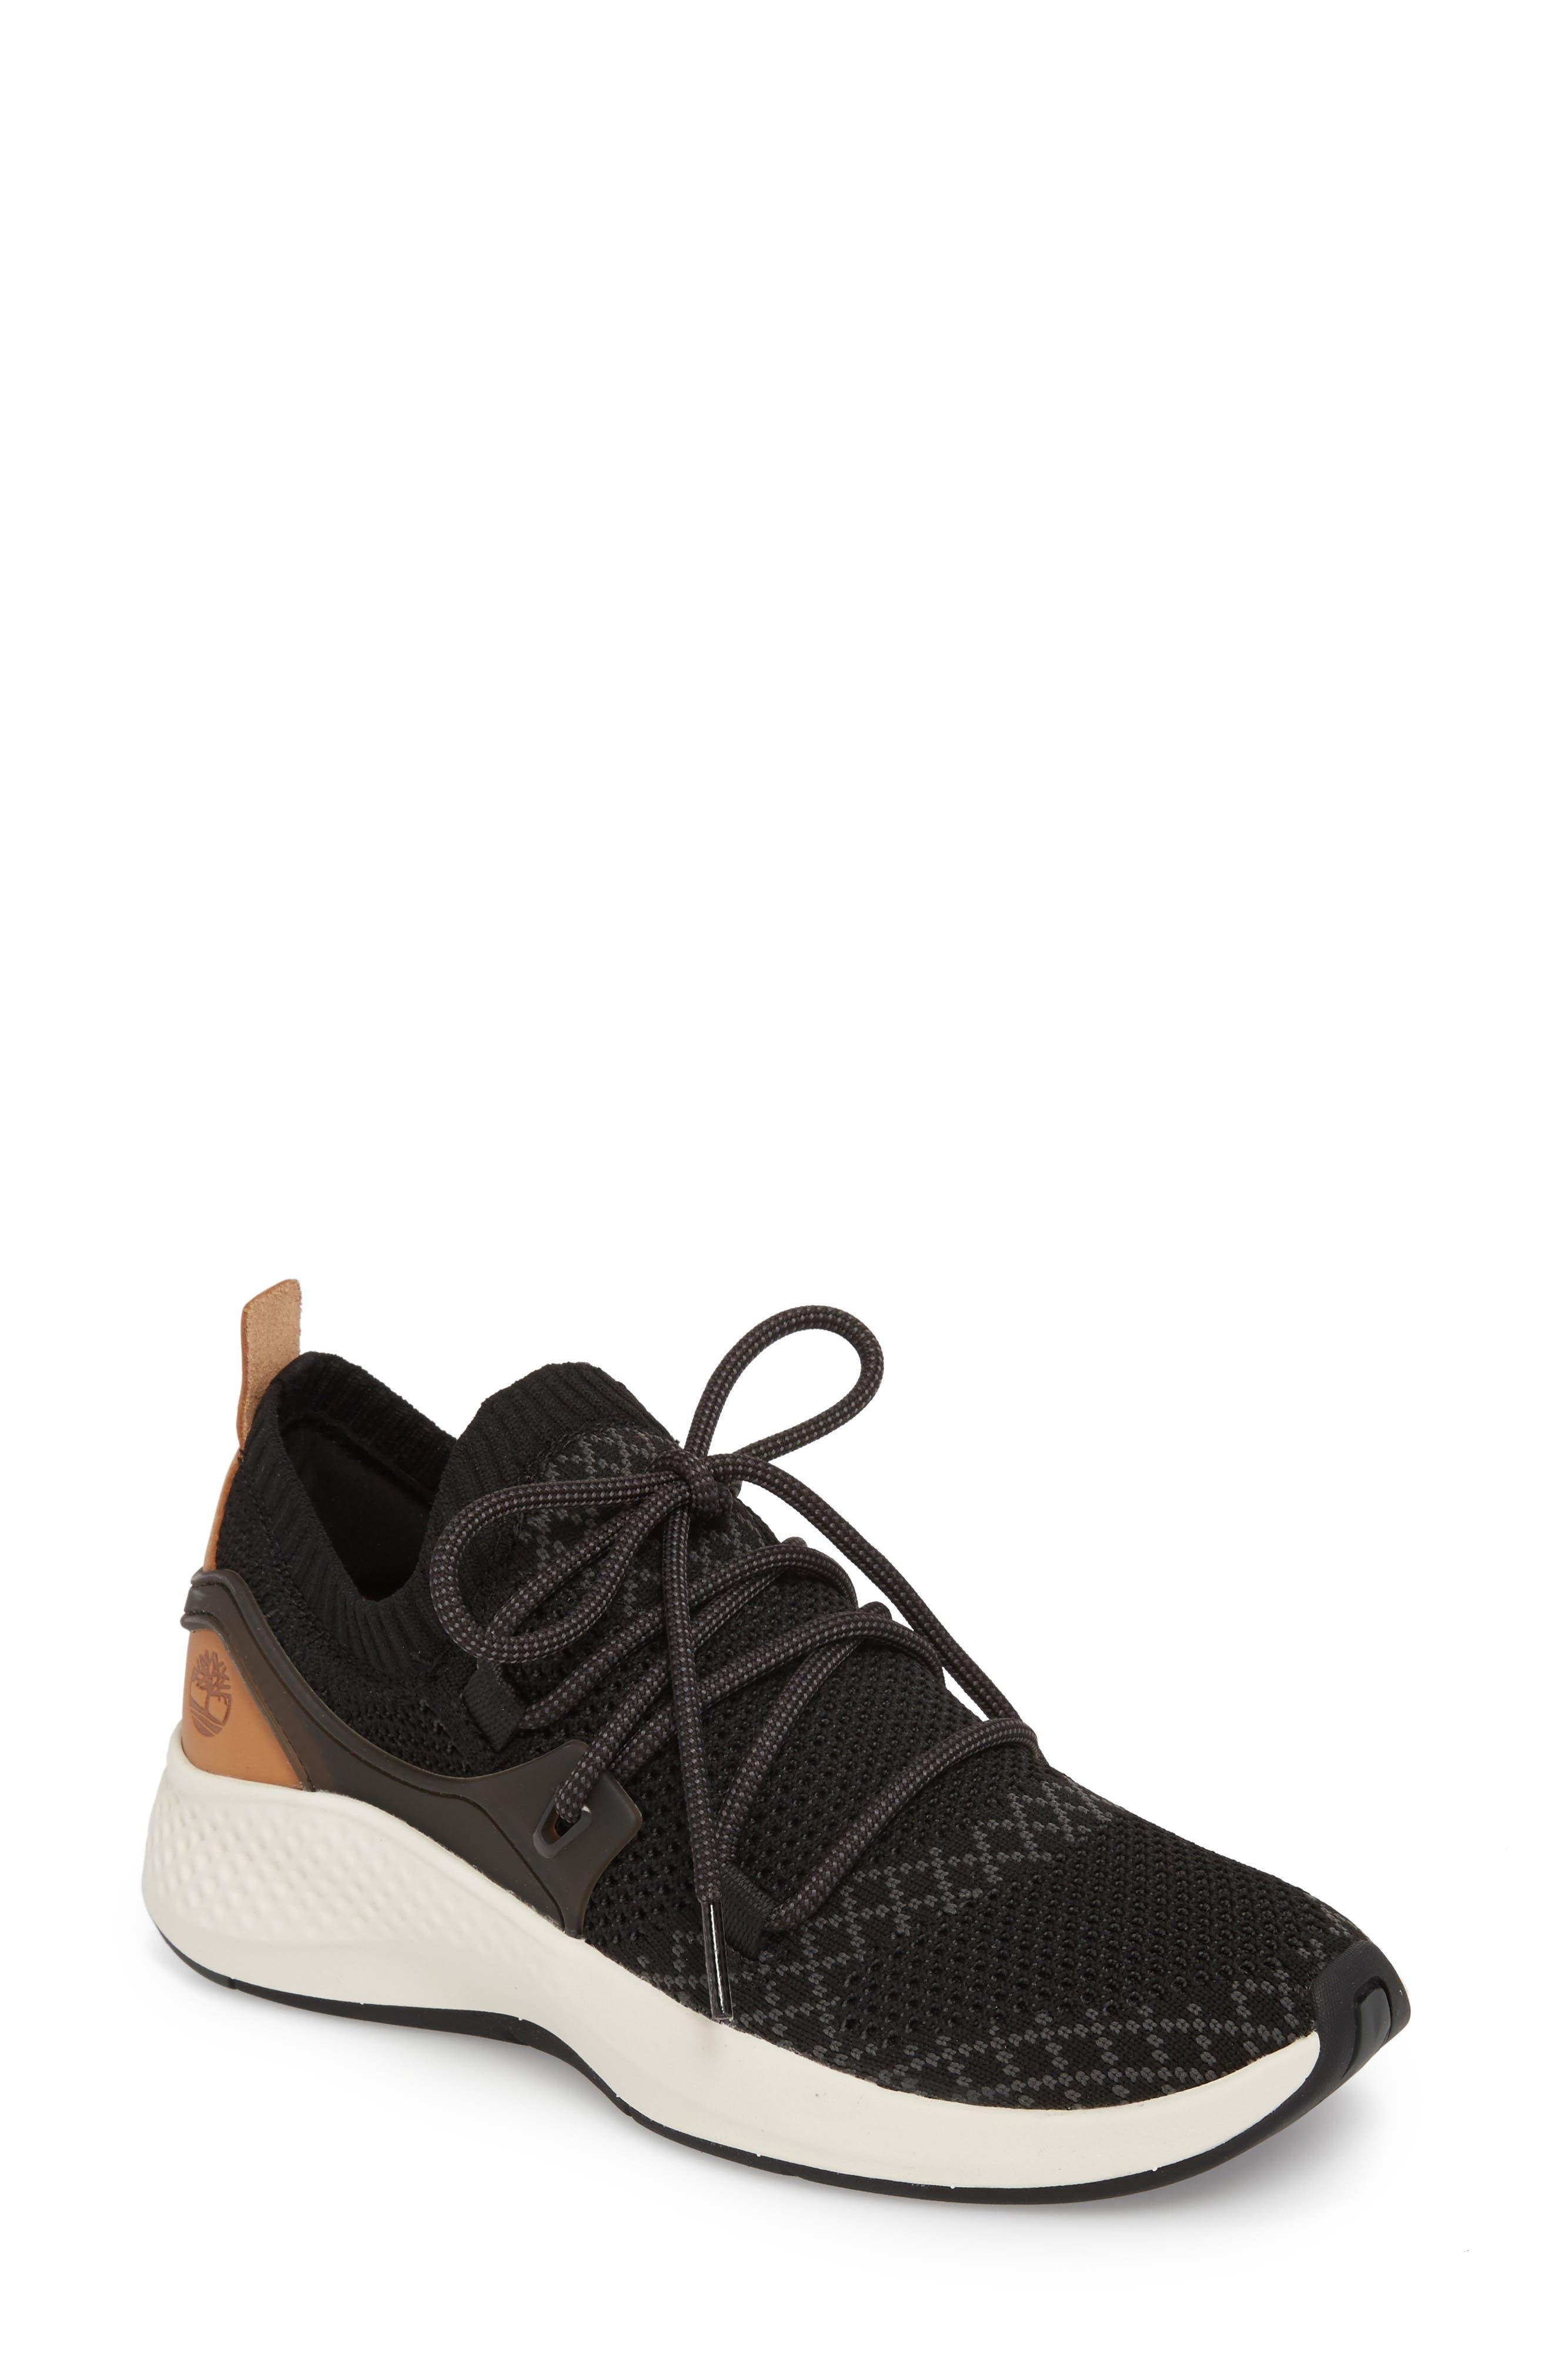 TIMBERLAND,                             FlyRoam Go Knit Sneaker,                             Main thumbnail 1, color,                             001